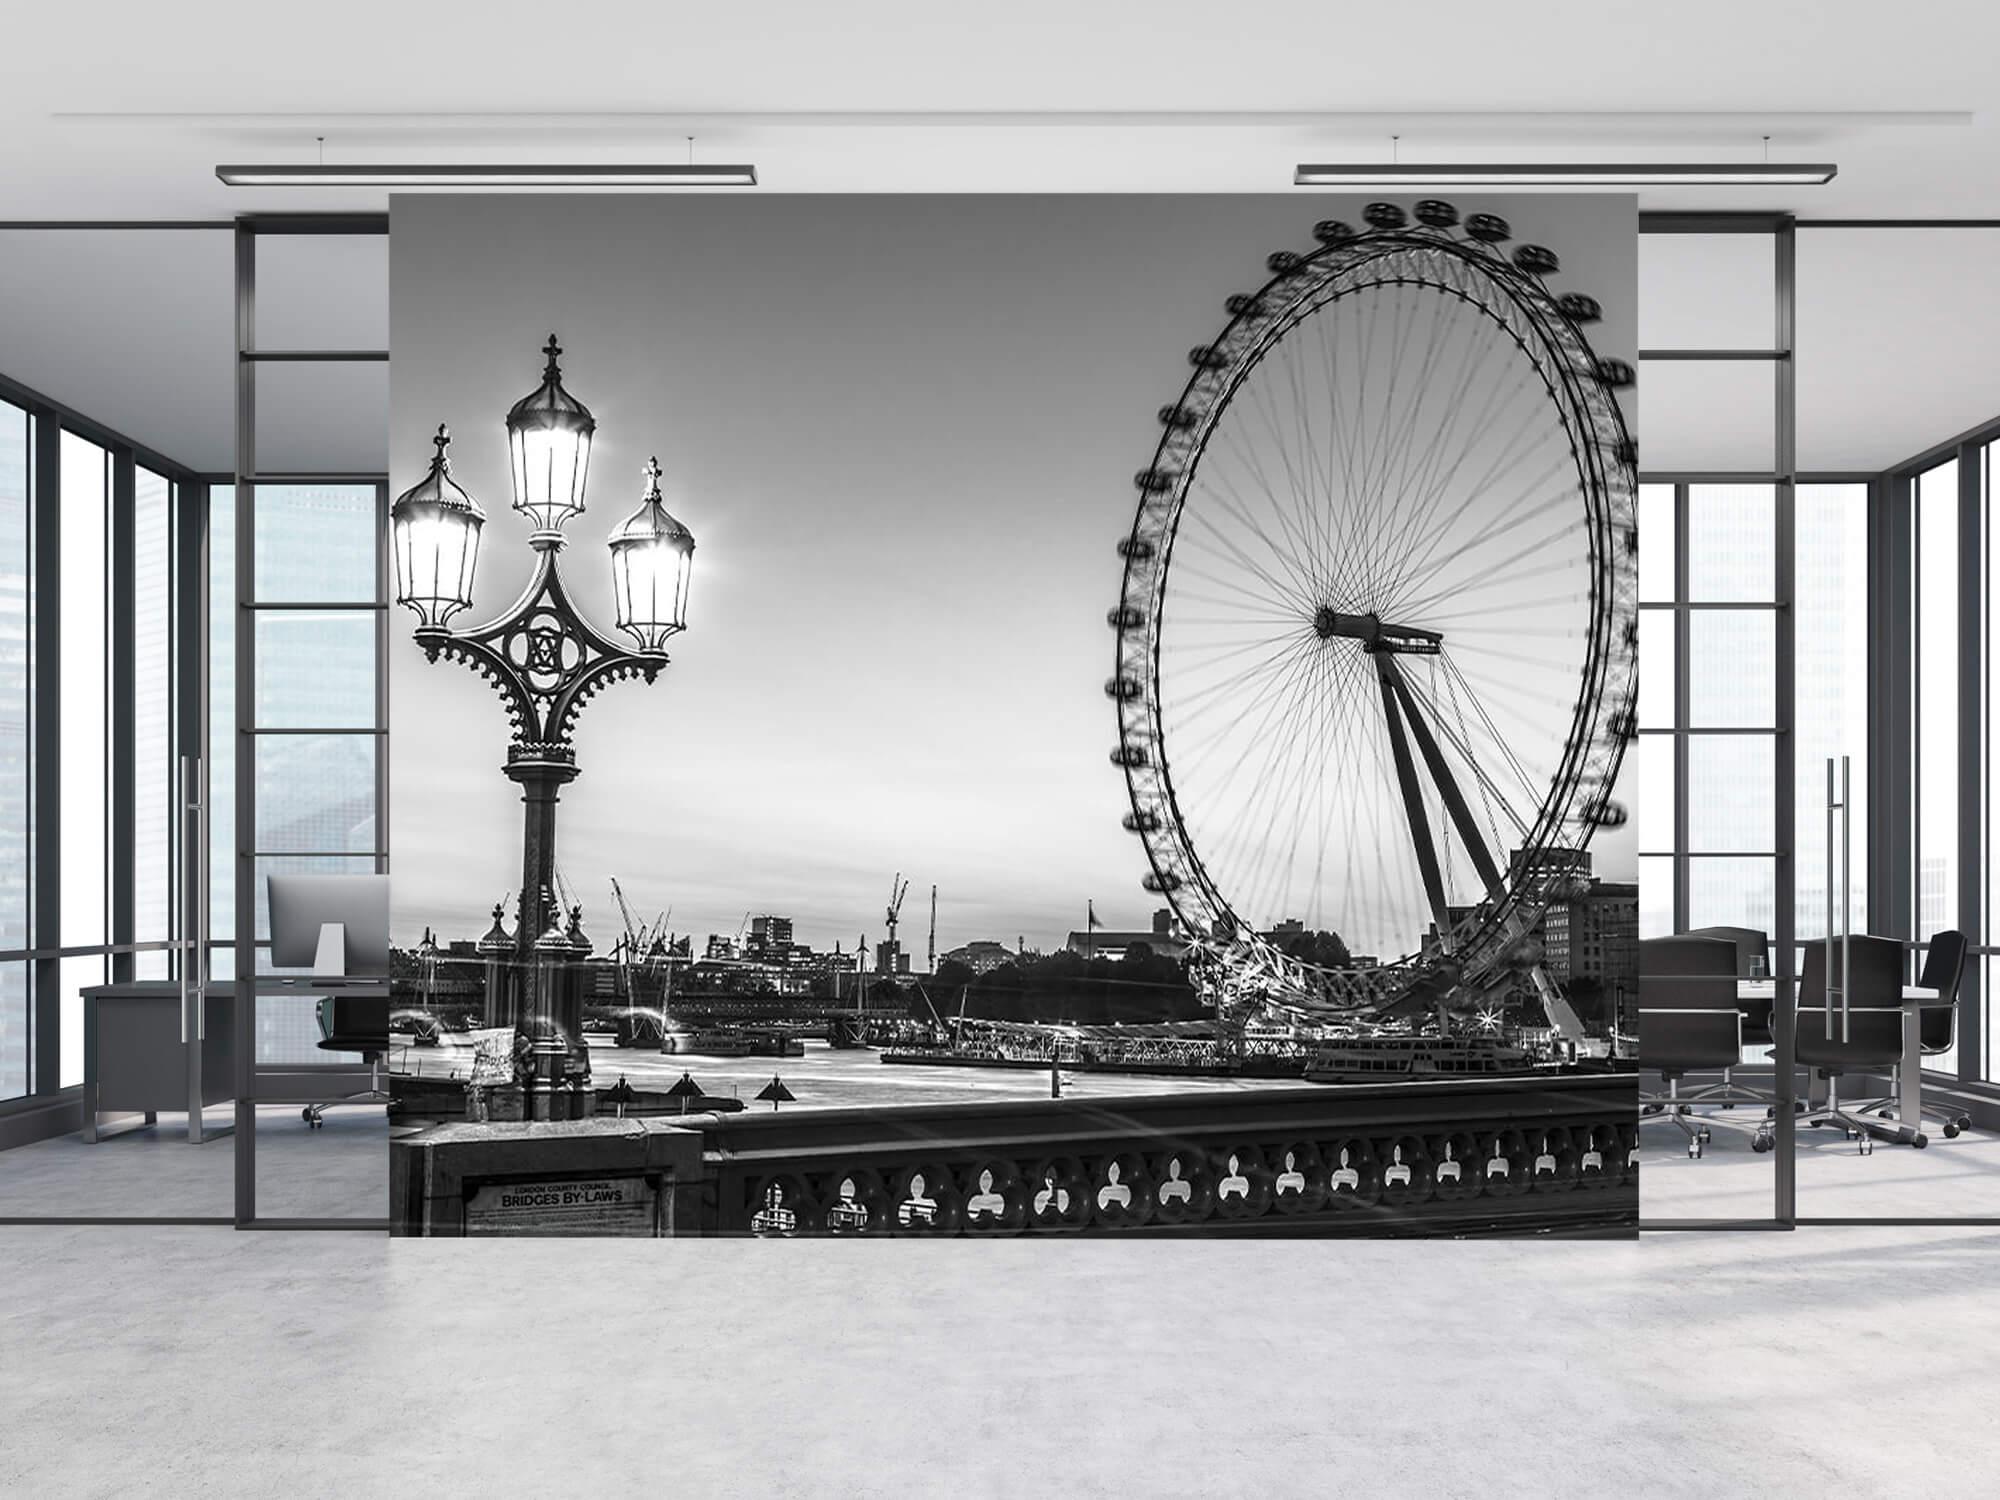 Ferris wheel black and white 12